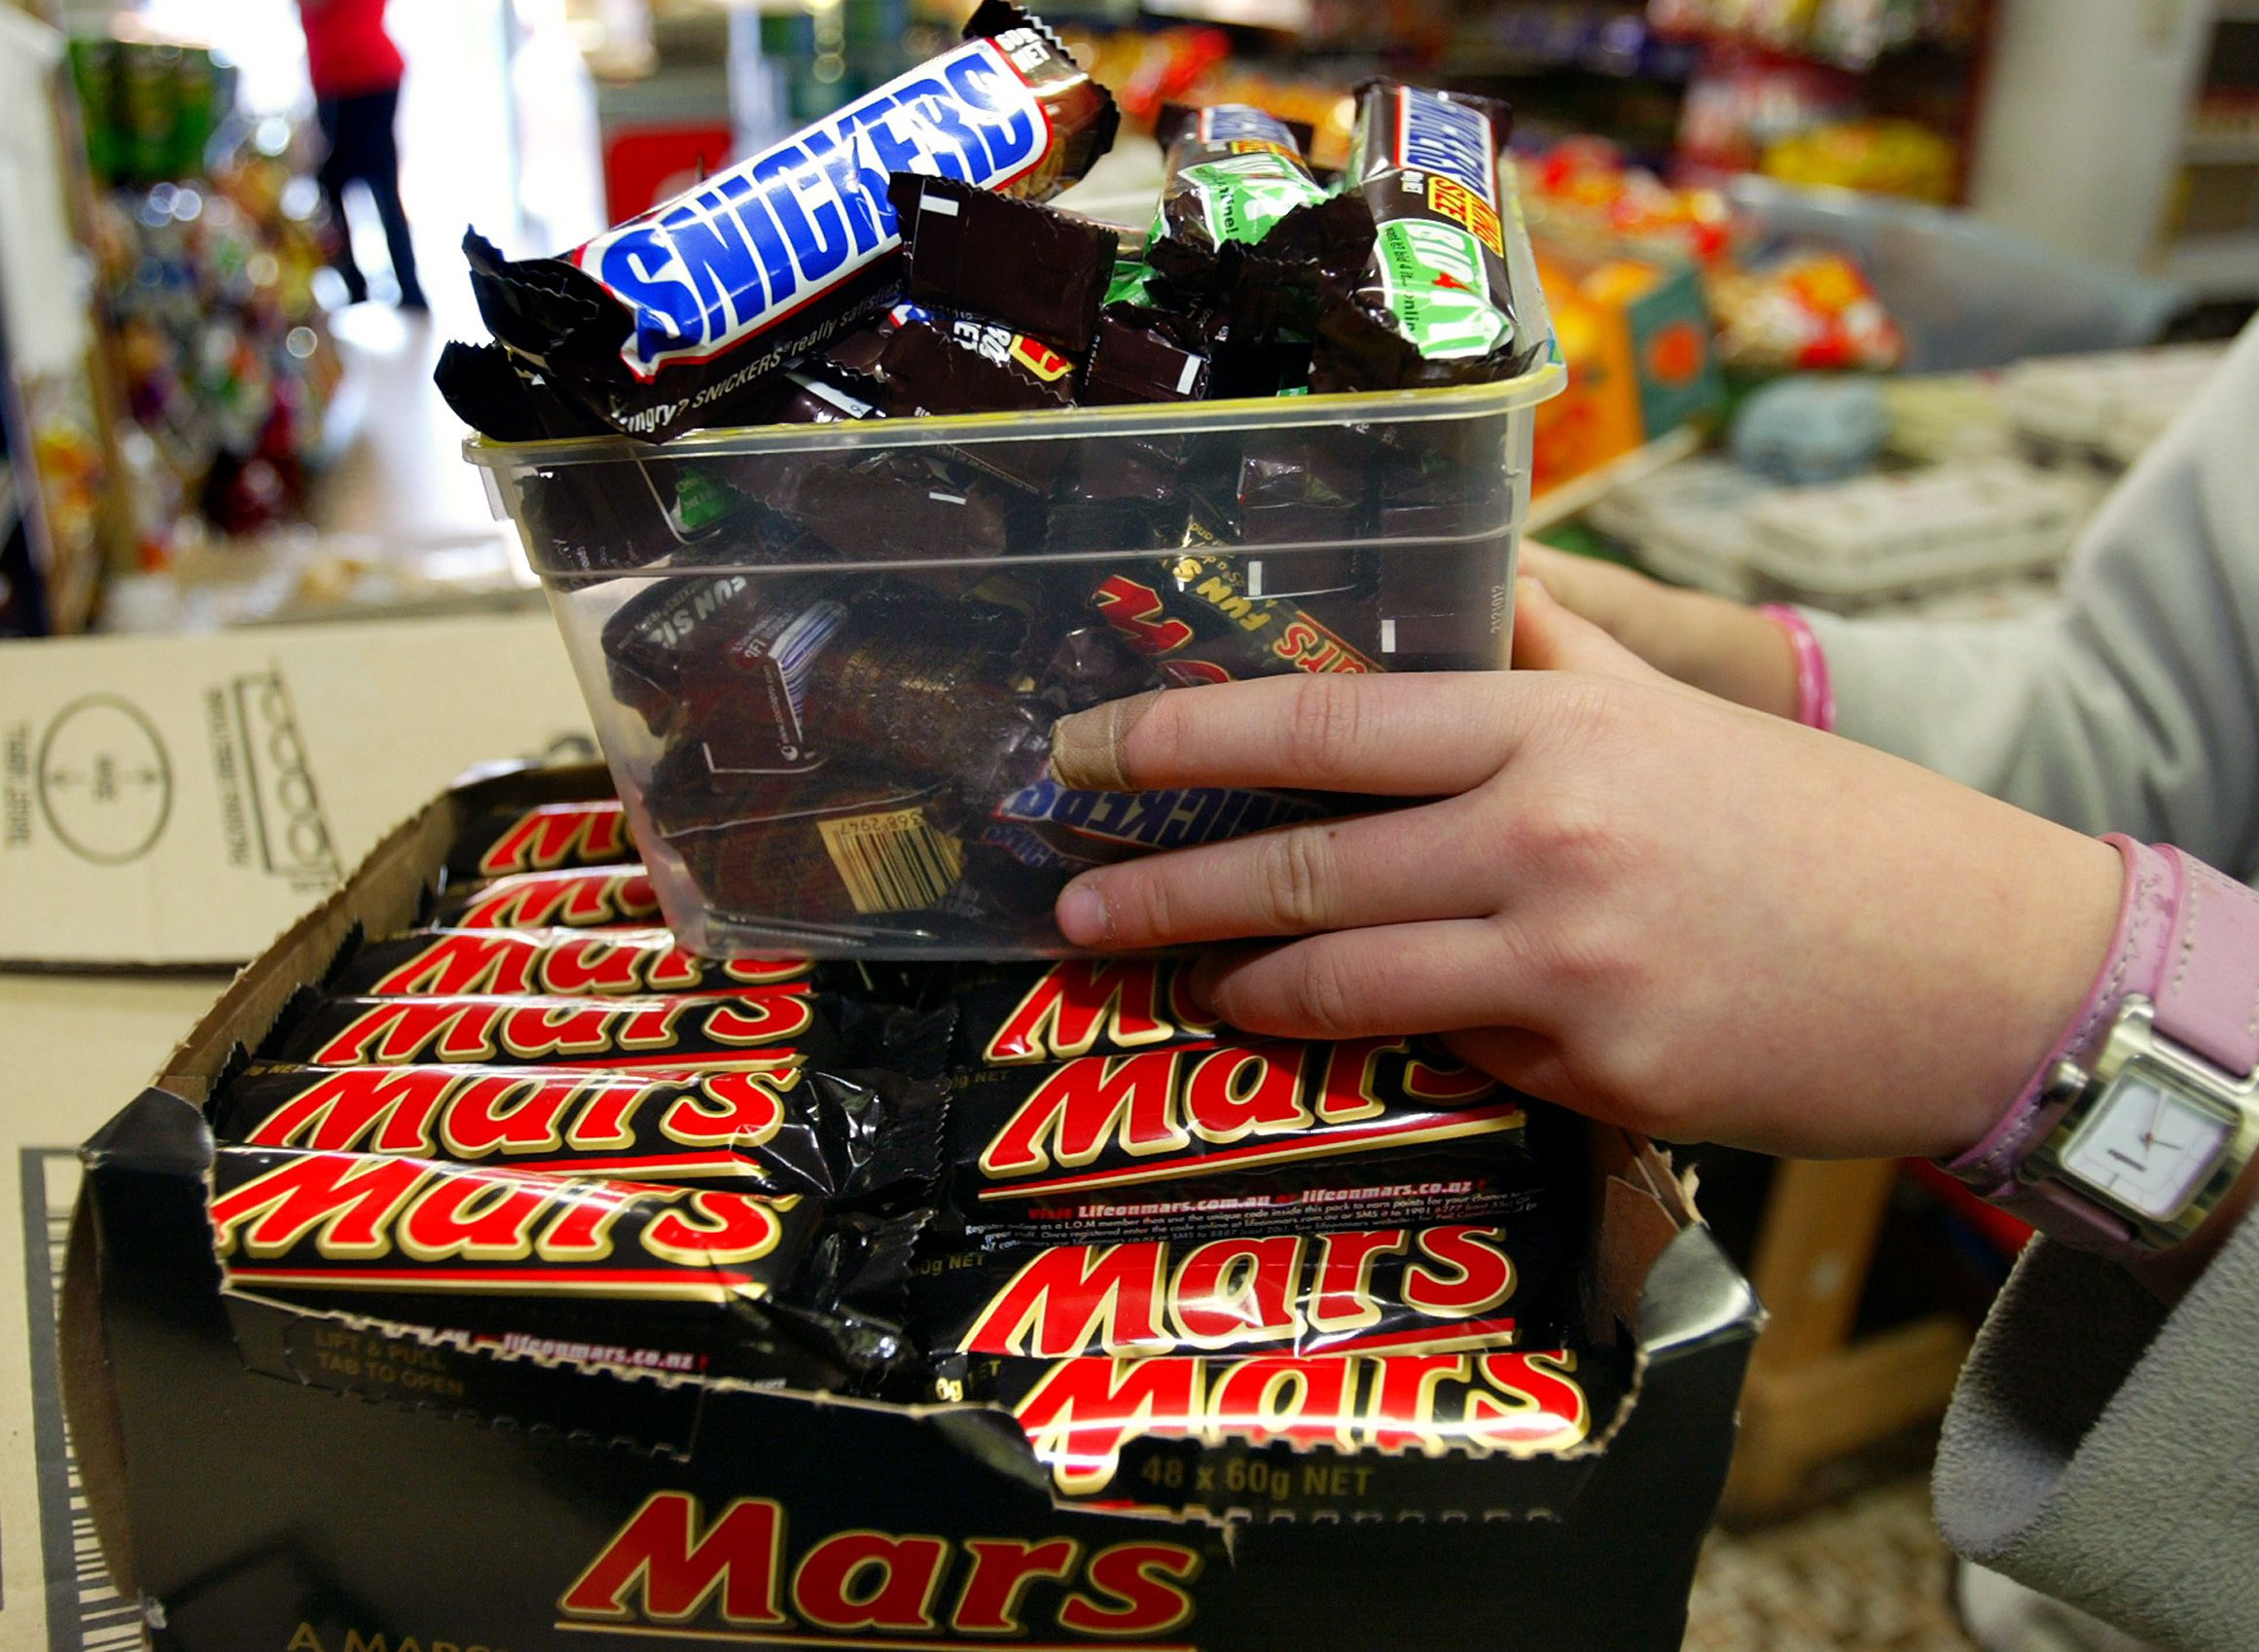 mars chocolate recall plastic